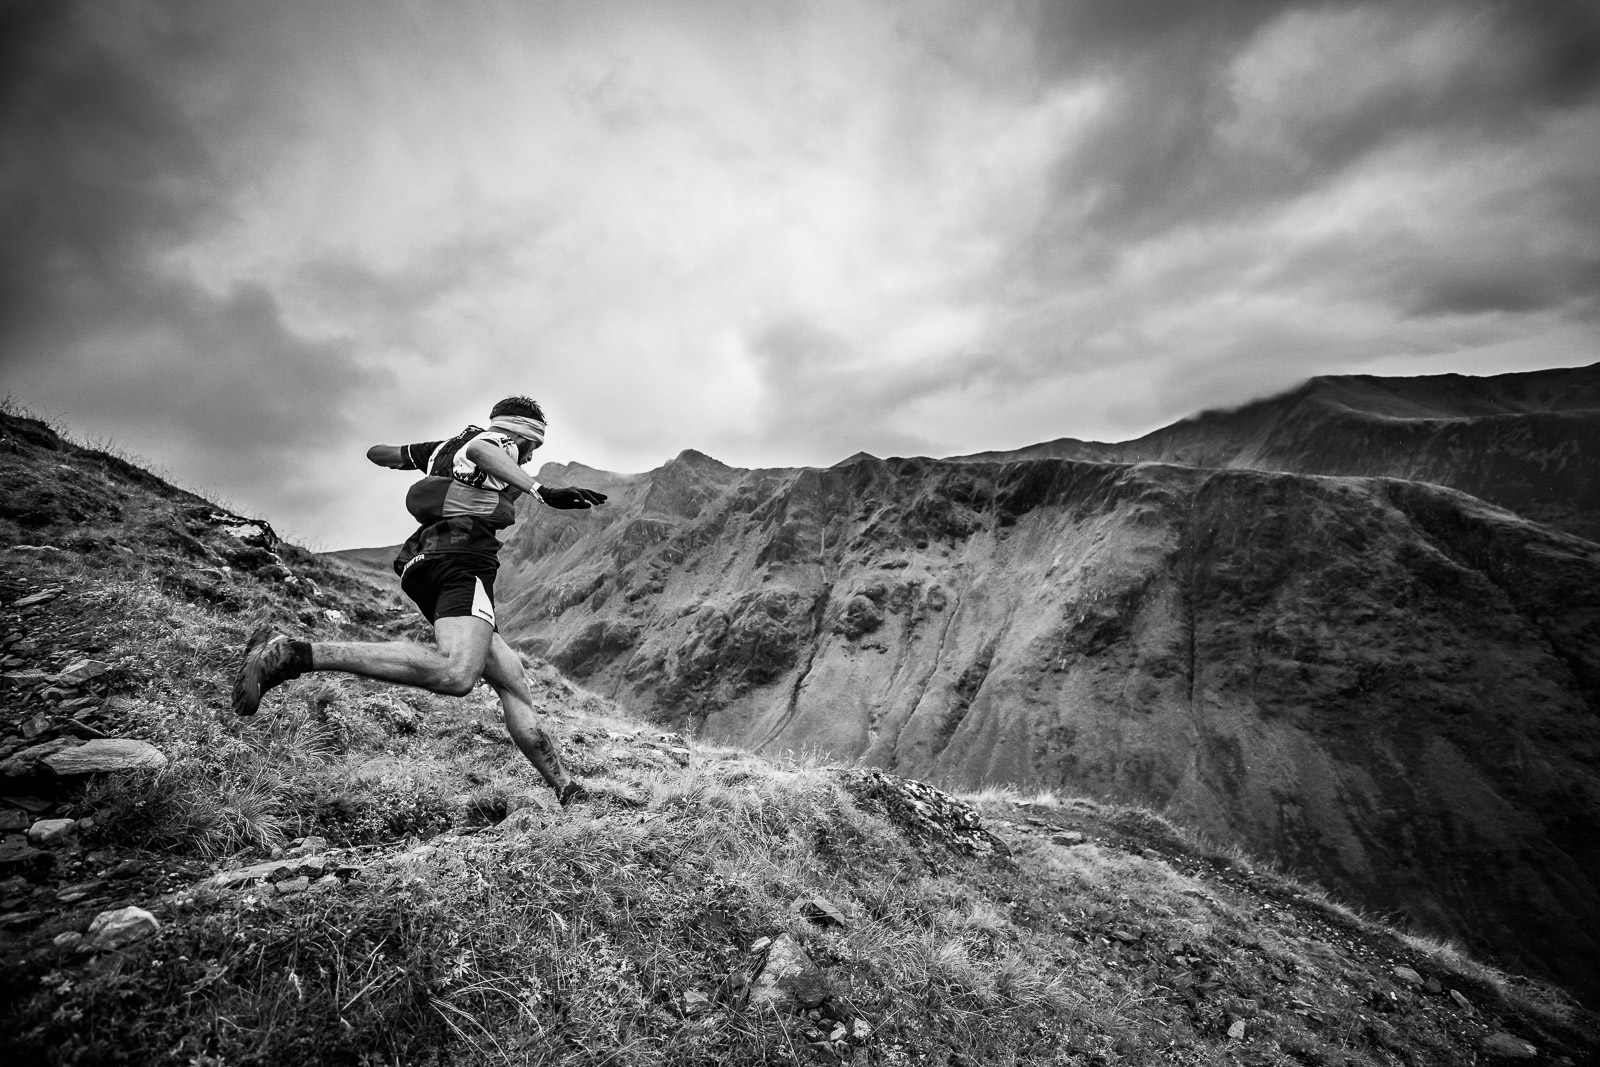 Skotsko fotografie skyrunning glencoe ring of steal, Lukáš Budínský